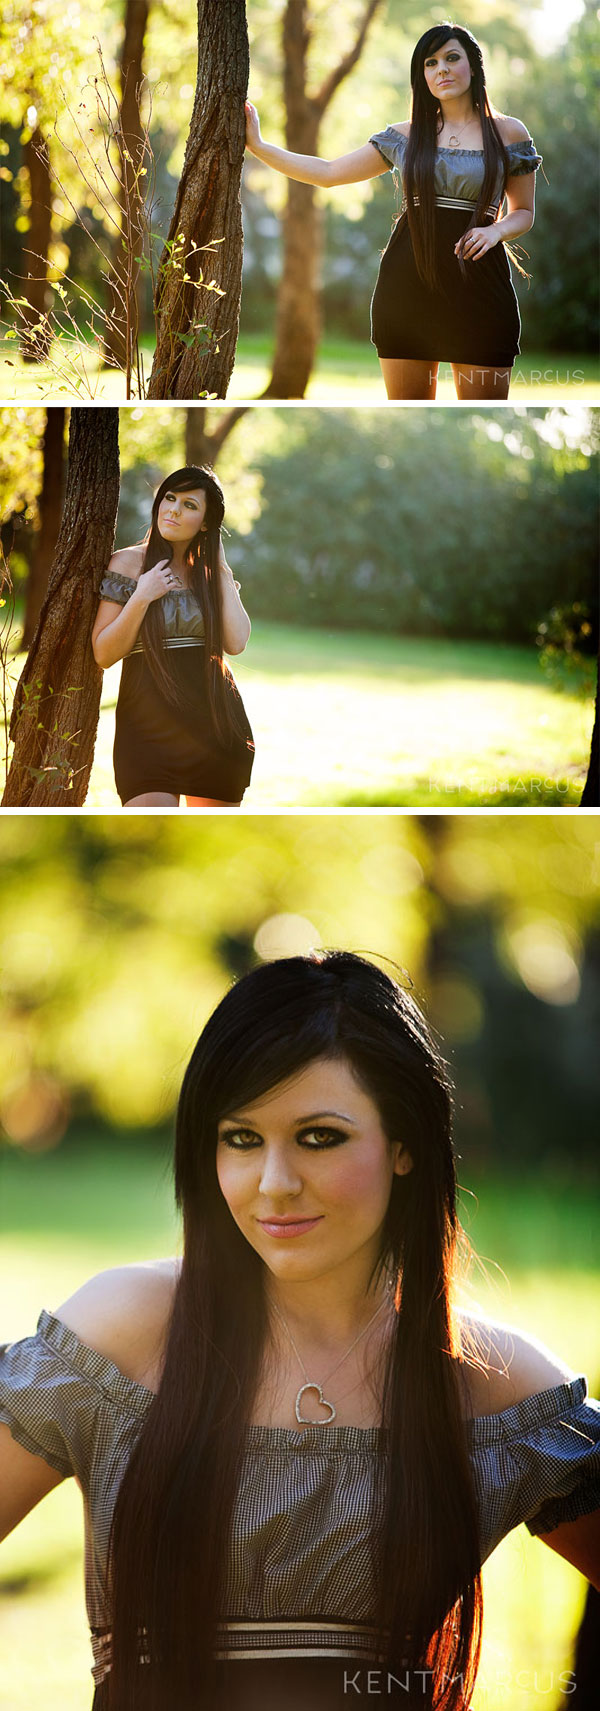 Female model photo shoot of Miss Joanna by KentMarcus in Brisbane AU